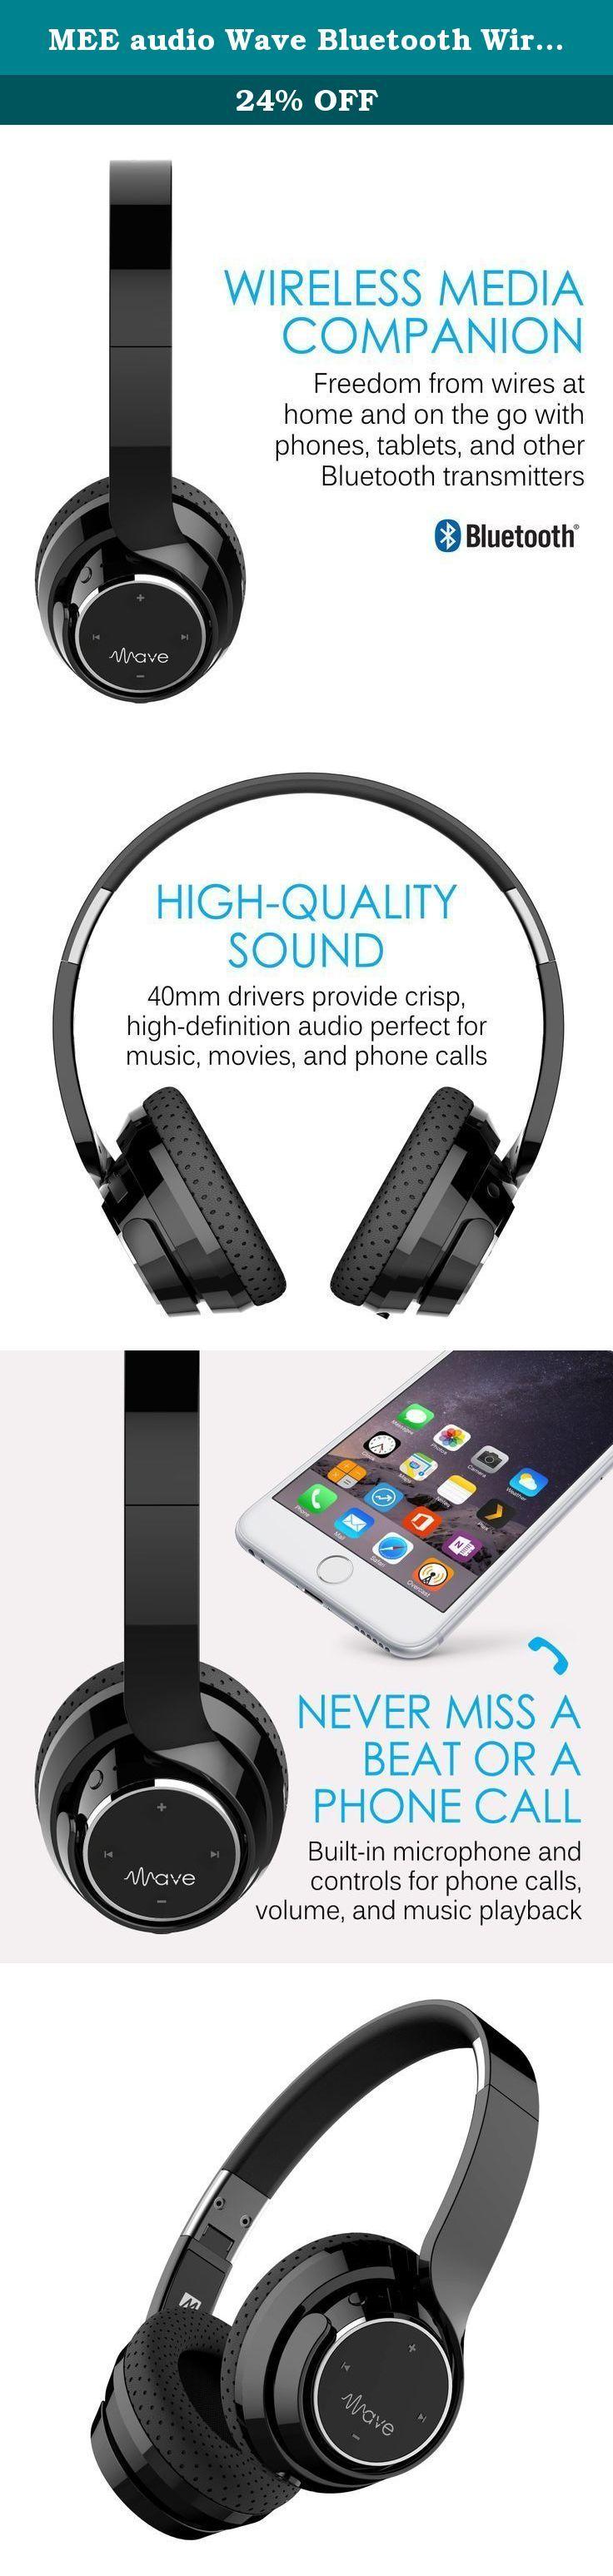 MEE audio Wave Bluetooth Wireless On-Ear Headphones with Headset Functionality. MEE audio Wave Bluetooth Wireless On-Ear Headphones with Headset Functionality. Black.